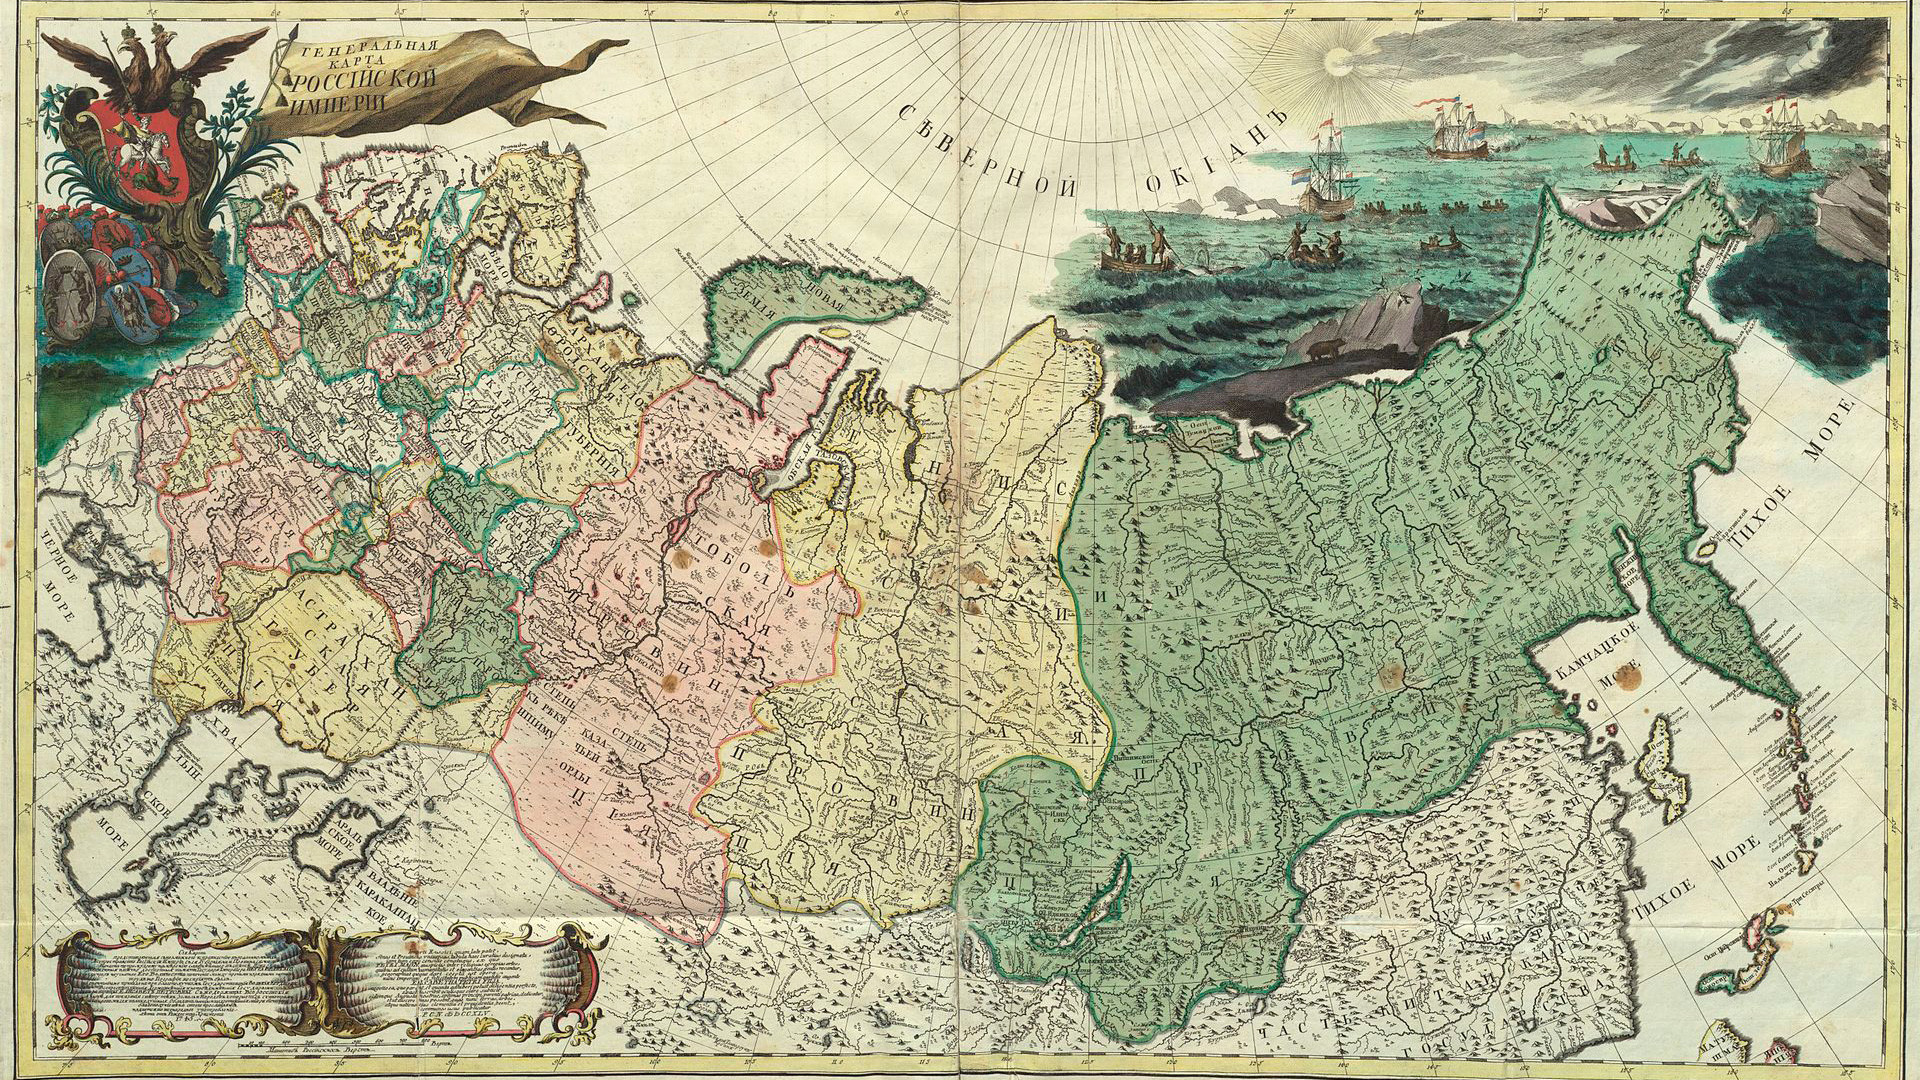 Russischer Atlas, 1745